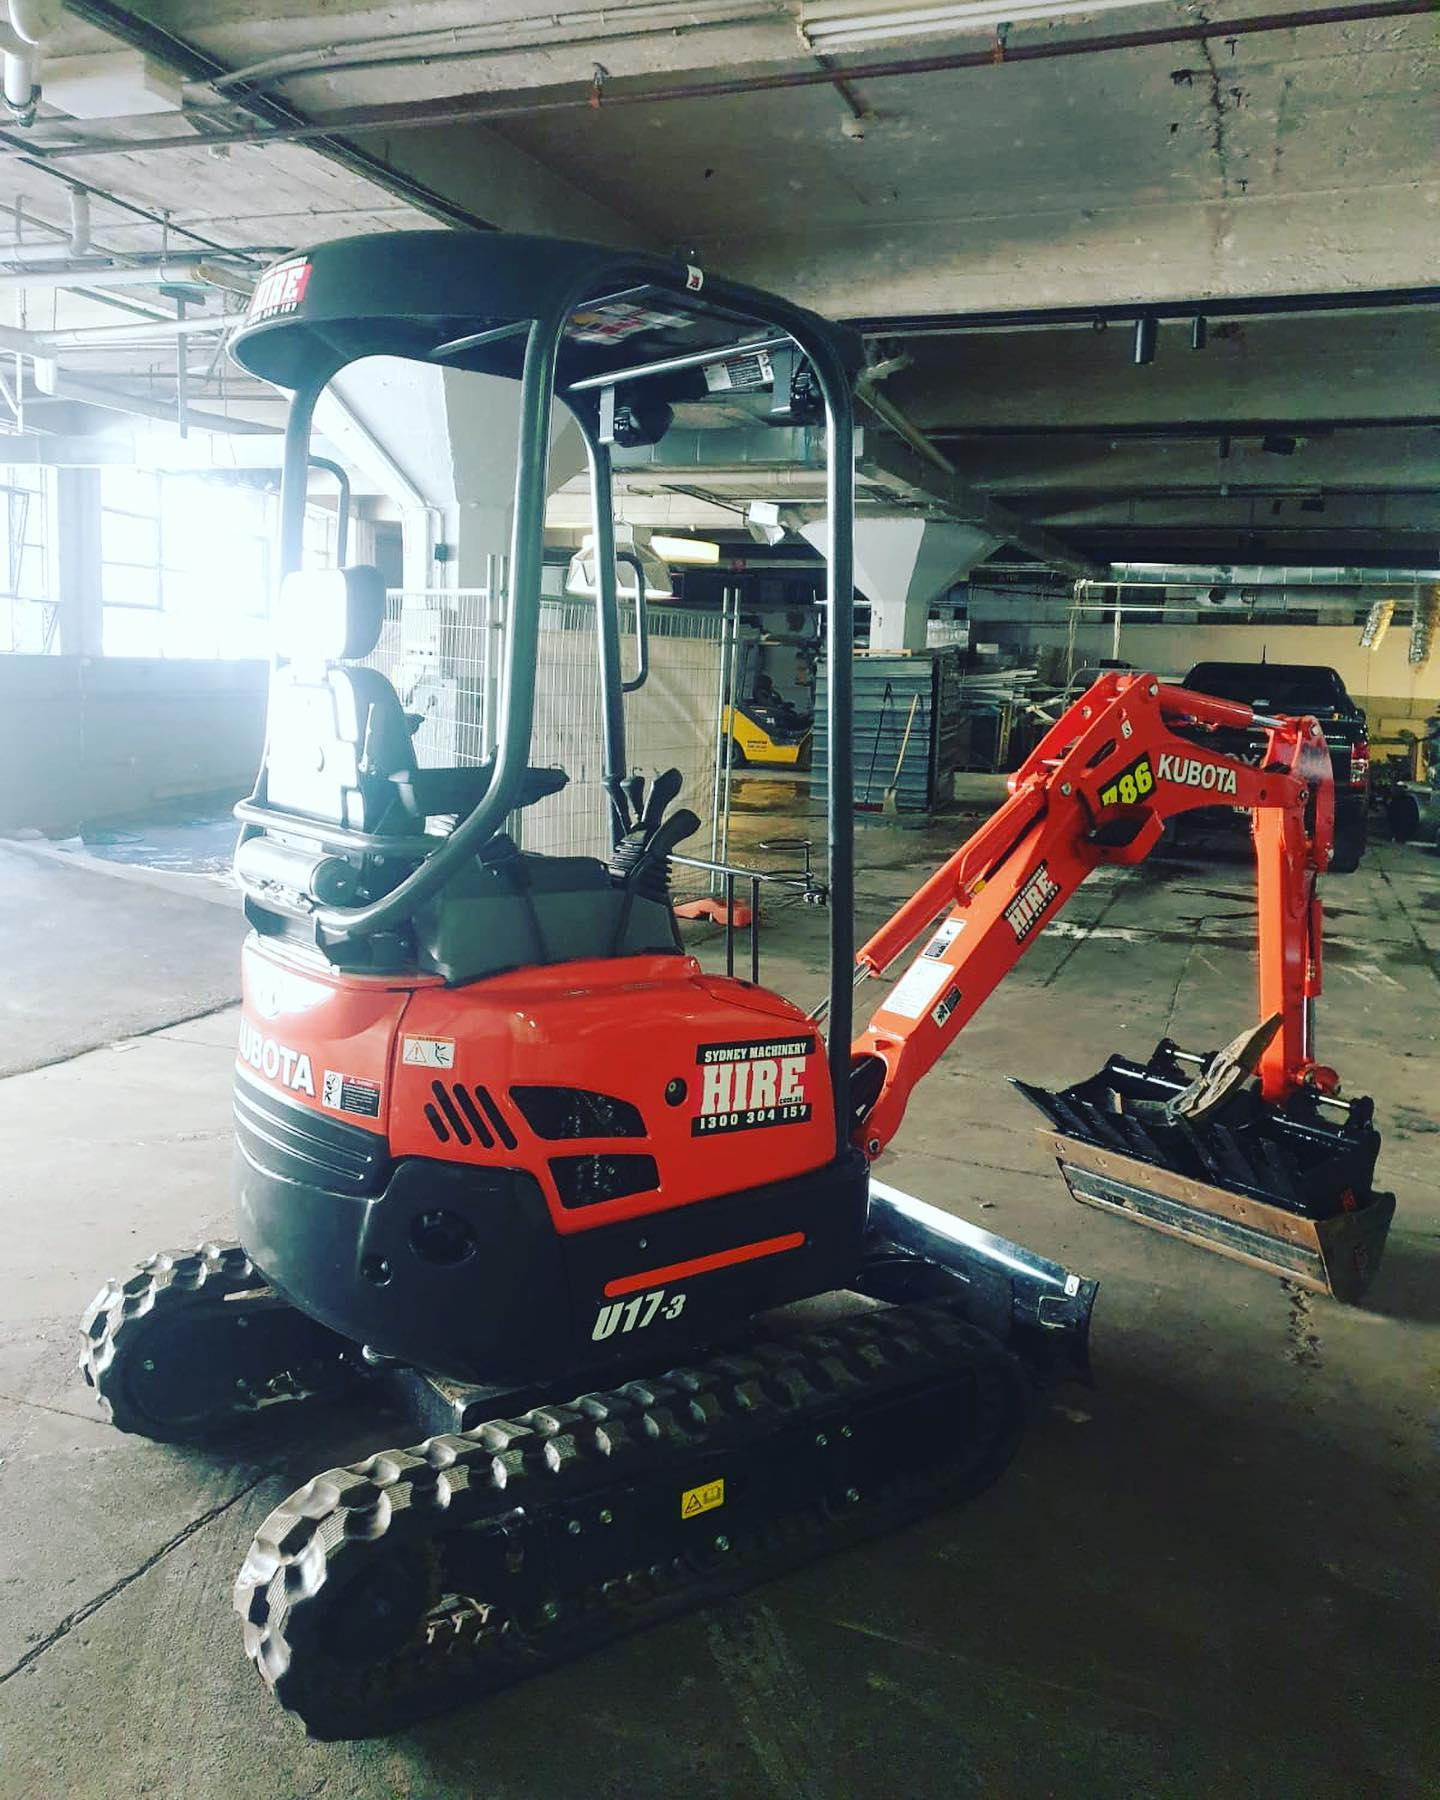 Hire Kubota 1.7 tonne zero swing tight access mini excavator – 3 buckets & trailer